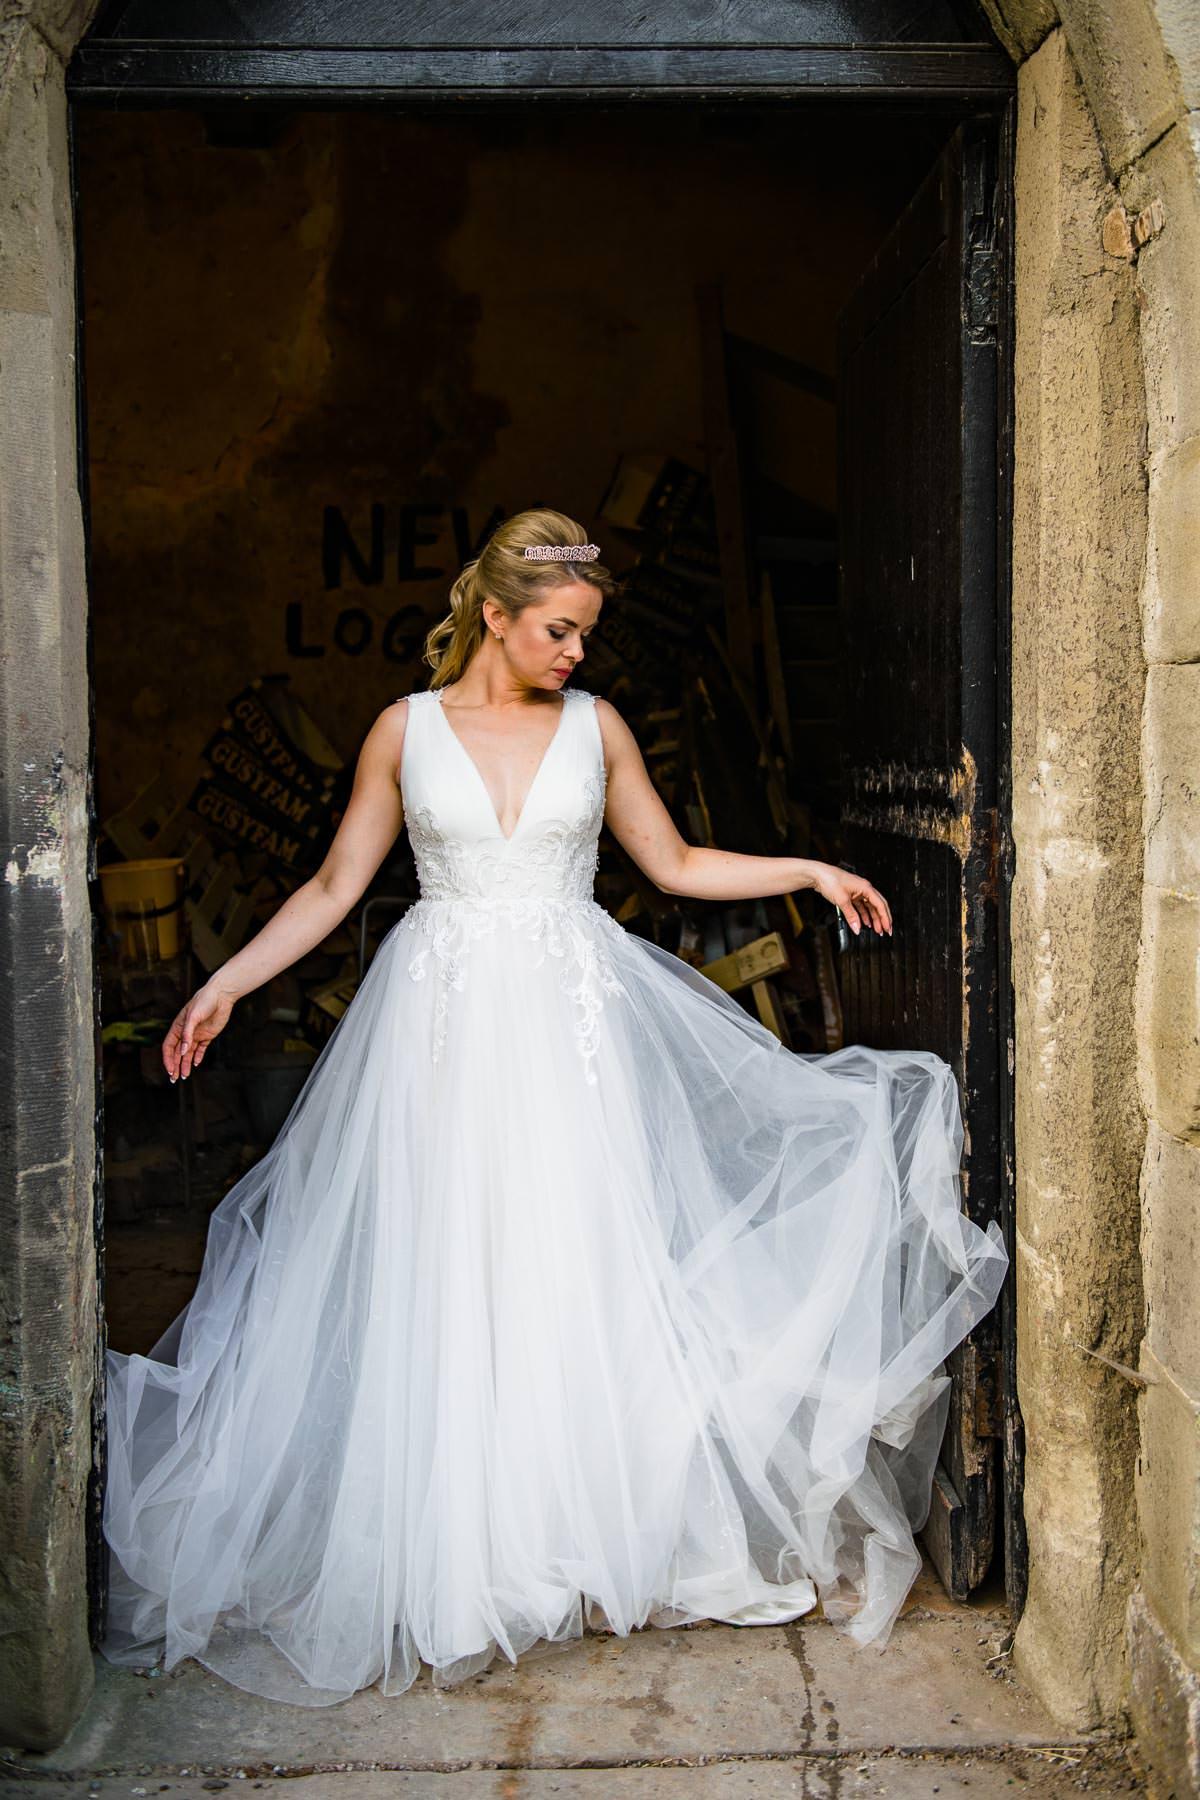 049Clearwell castle wedding photos Jonny Barratt Photography